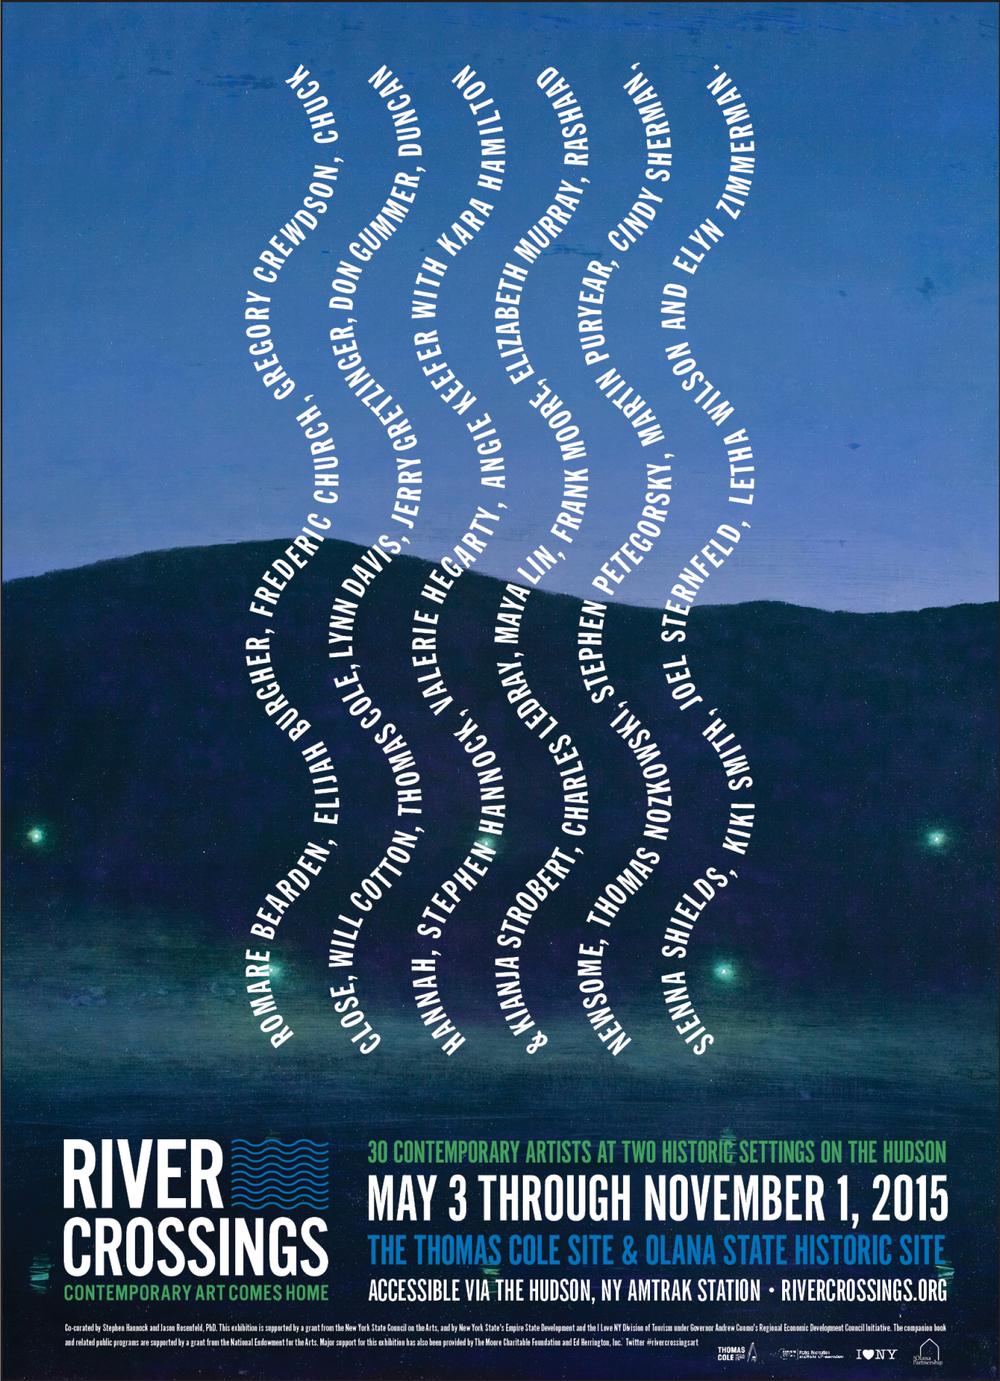 River Crossings Branding Carla Rozman Graphic Design Ad.jpg